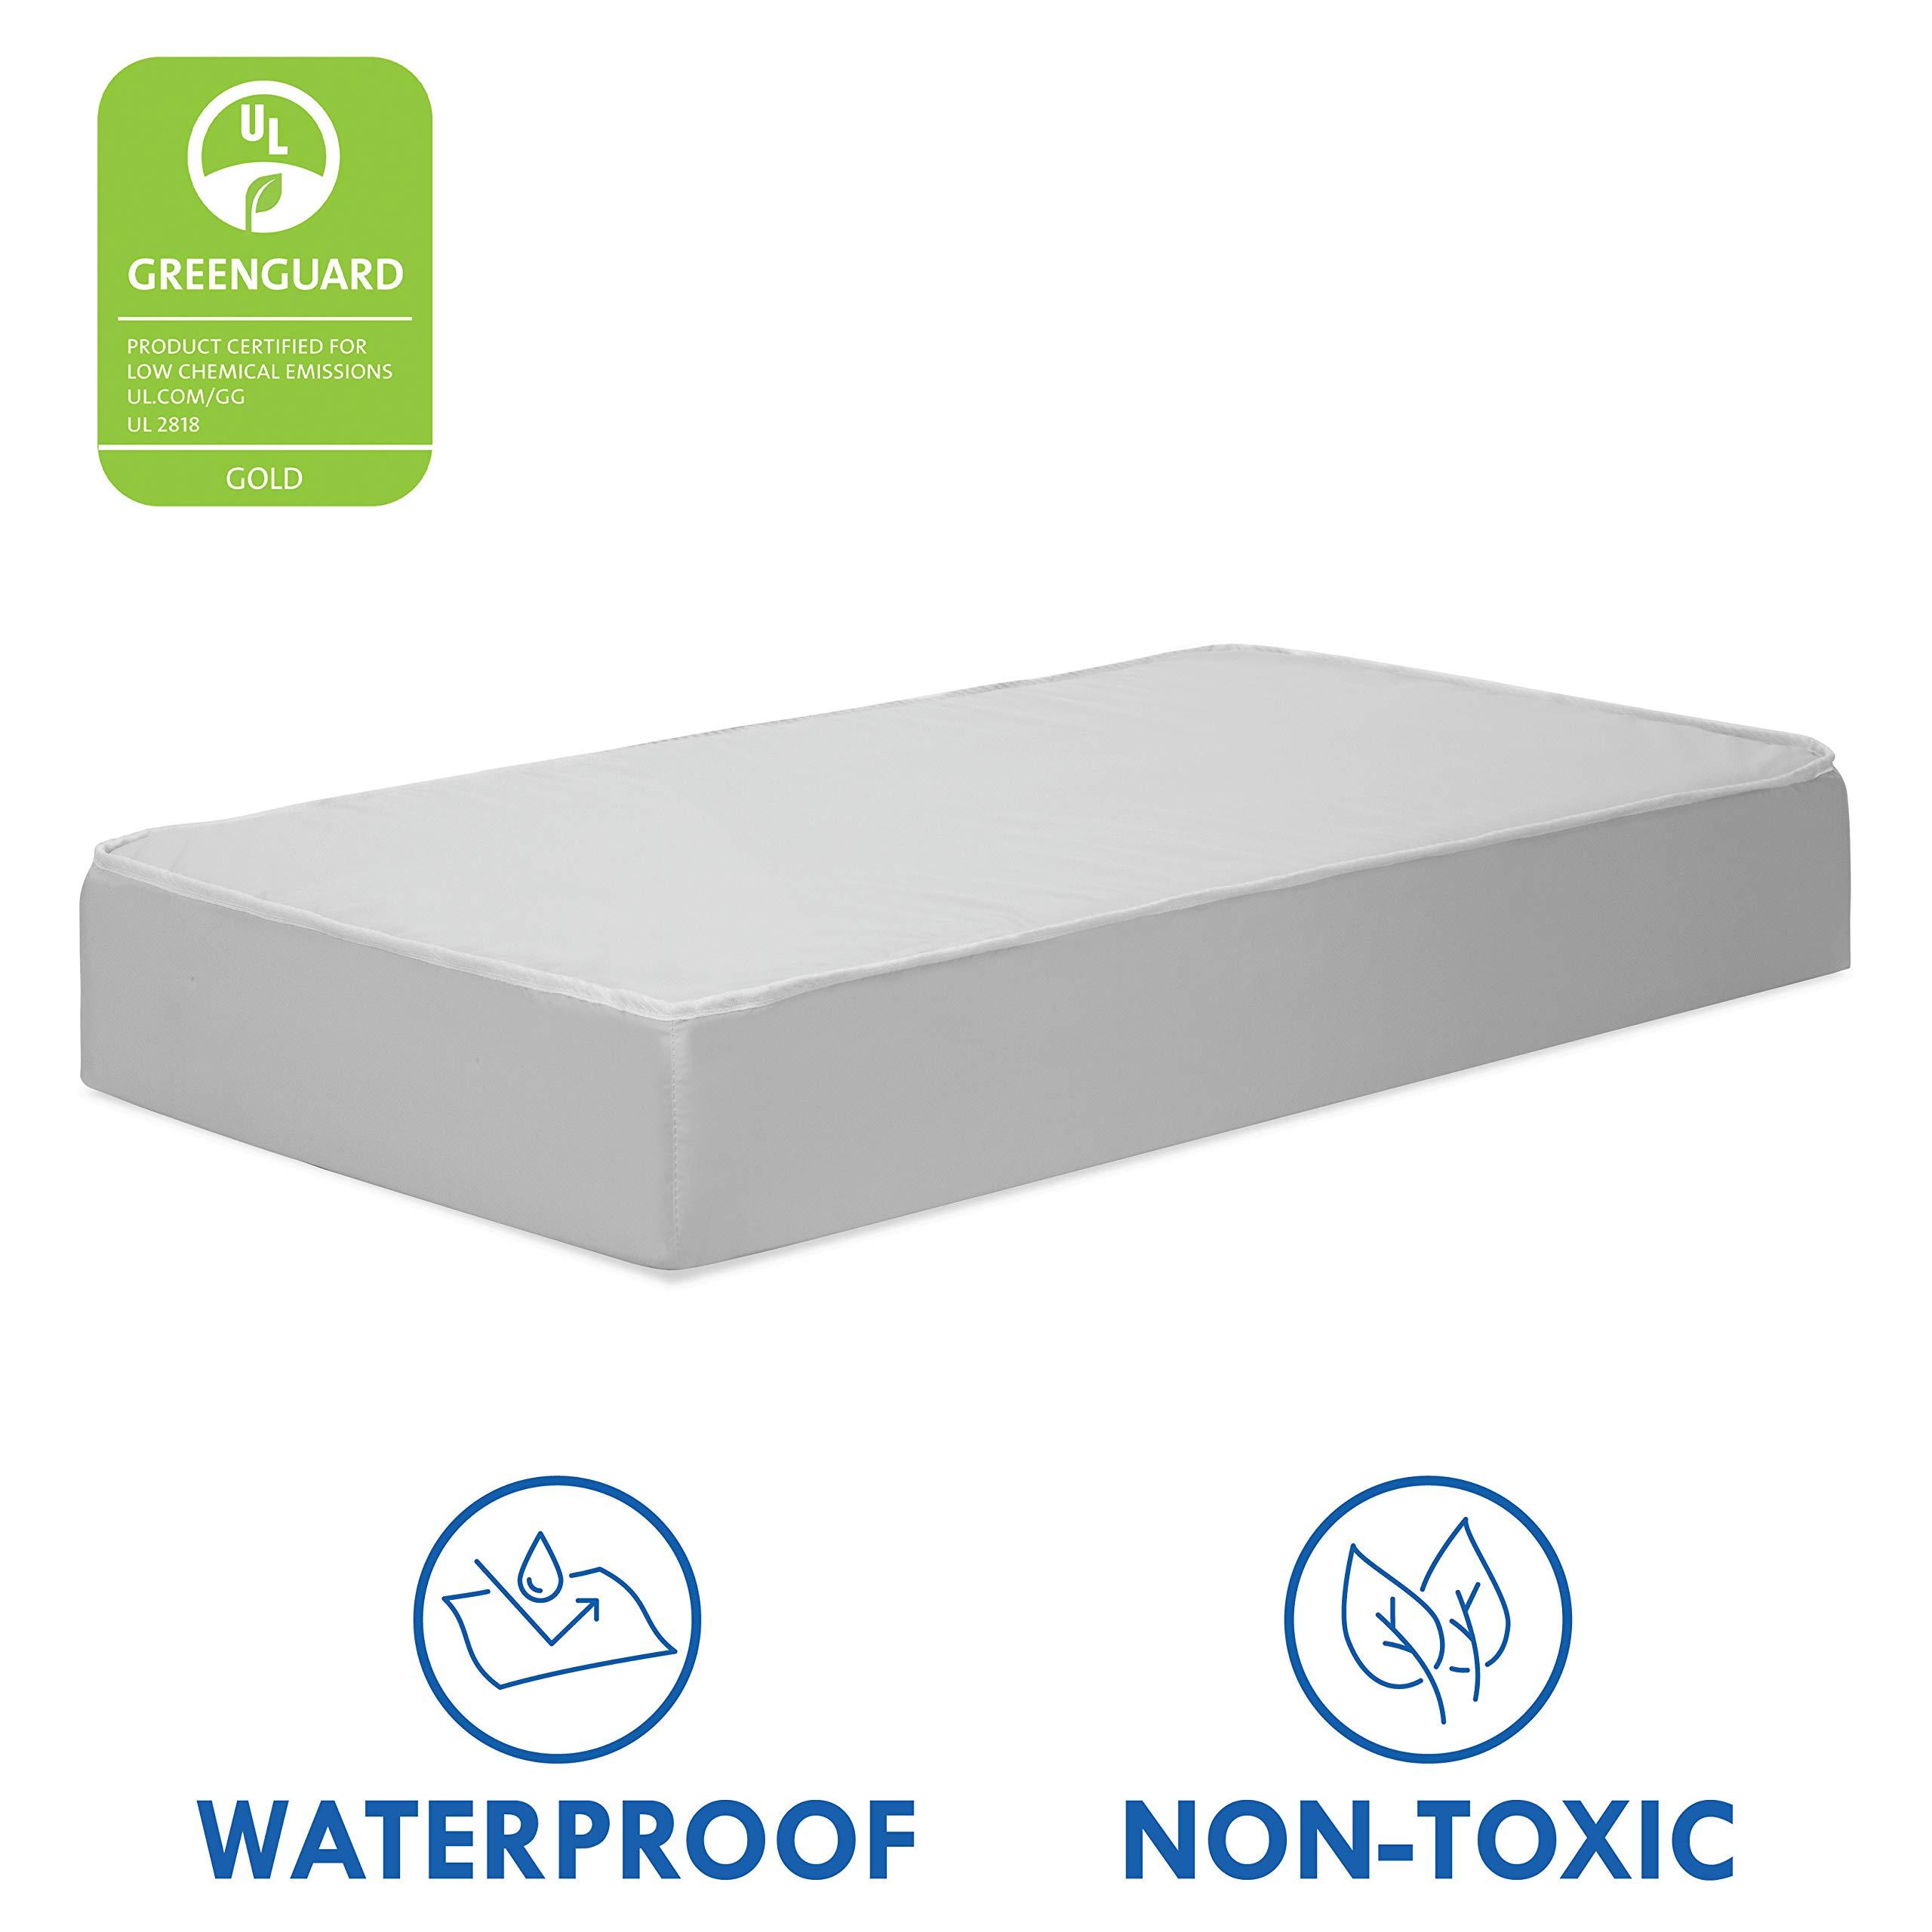 DaVinci Complete Slumber Waterproof MINI Crib Mattress | Firm Support | GREENGUARD Gold Certified | Lightweight | 100% Non-Toxic, White by DaVinci